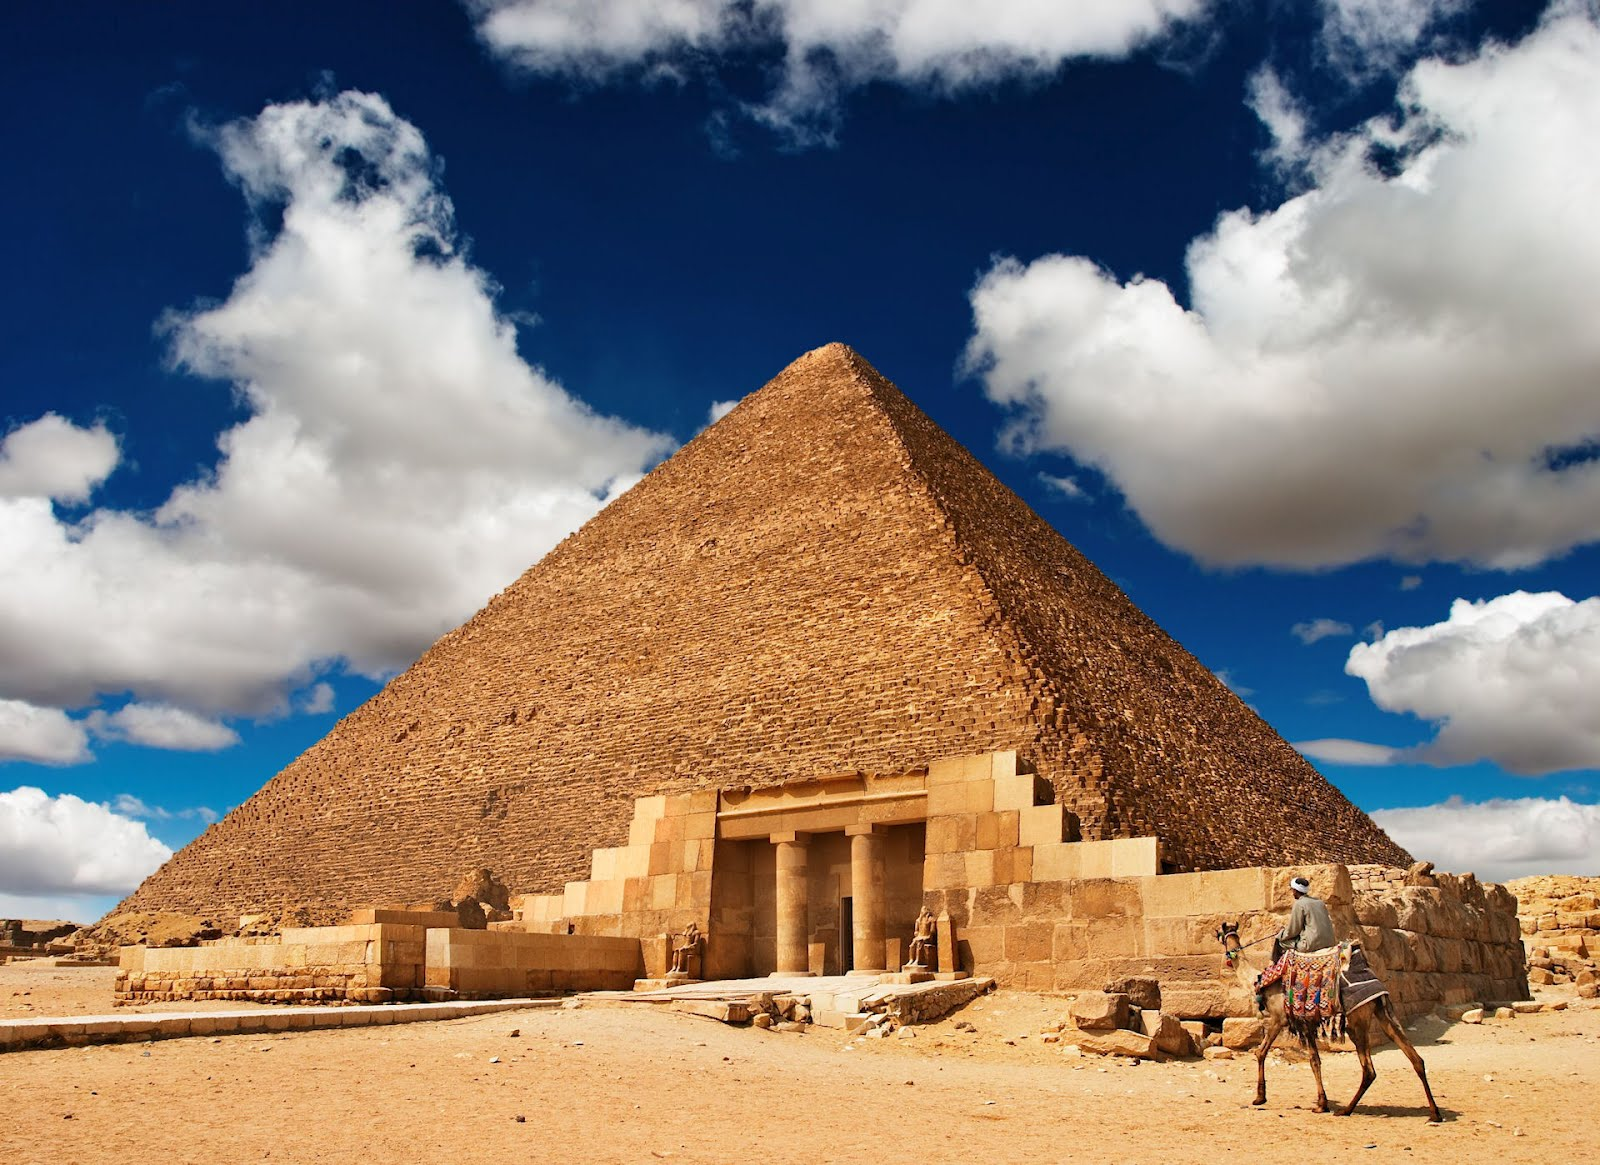 http://1.bp.blogspot.com/-0_oNvnMjX6k/T-5z2w1Rb1I/AAAAAAAA-Go/zTdv-tp1_BM/s1600/piramide-de-giza-en-egipto-g.jpg